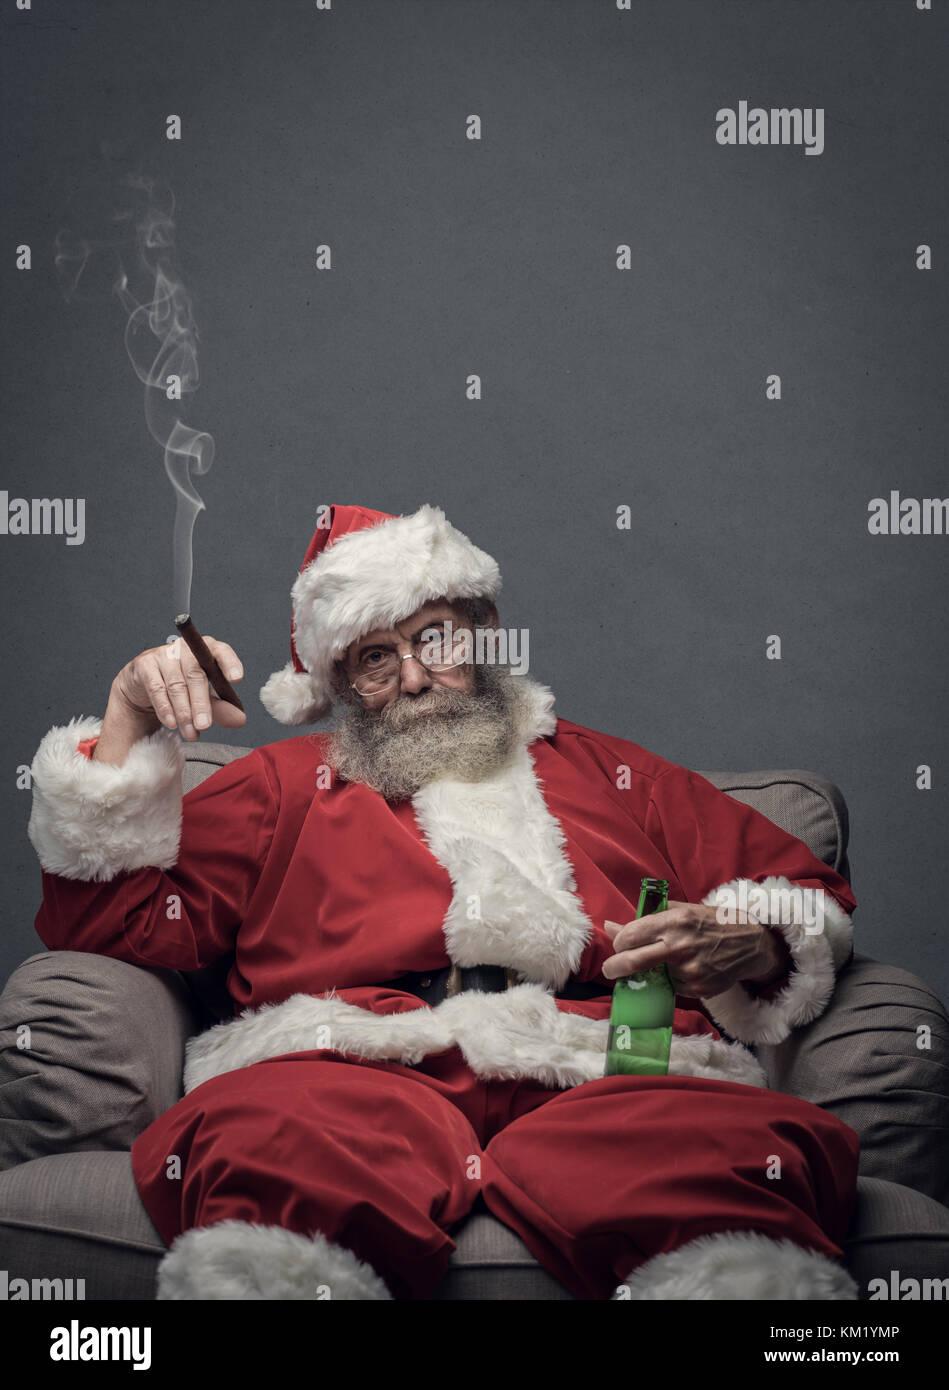 Bad Santa celebrating Christmas at home alone, he is smoking a cigar and drinking beer - Stock Image